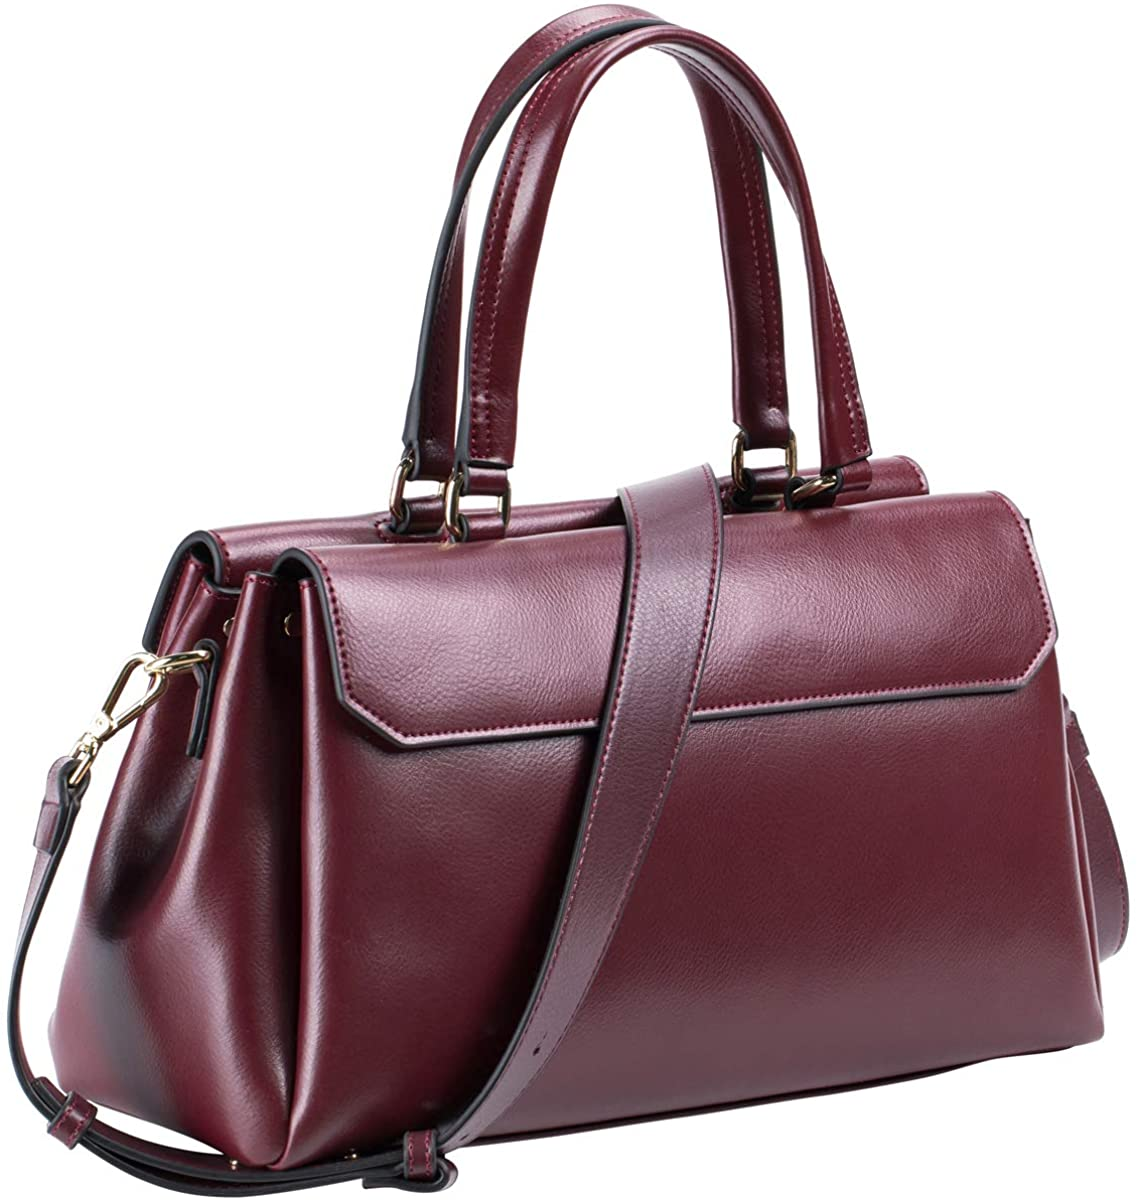 Genuine Leather Handbags for Women Top Handle Satchel Purse Shoulder Bag Vegan Zip Crossbody Bag Red